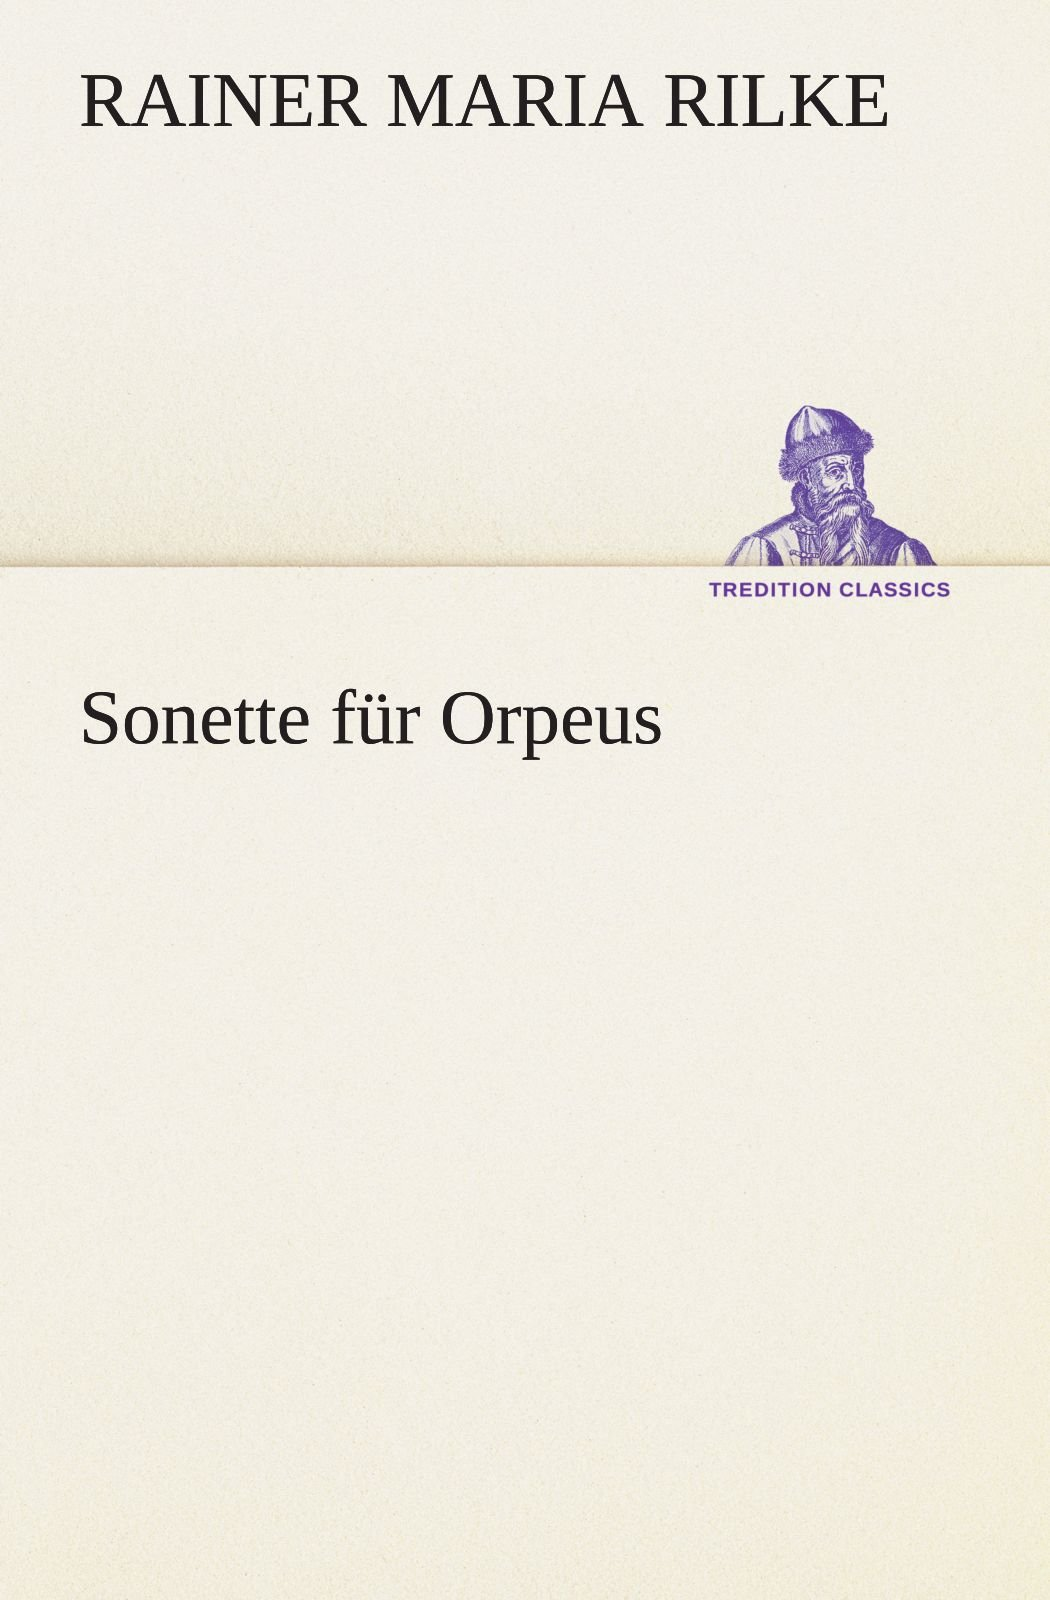 Download Sonette für Orpeus (TREDITION CLASSICS) (German Edition) pdf